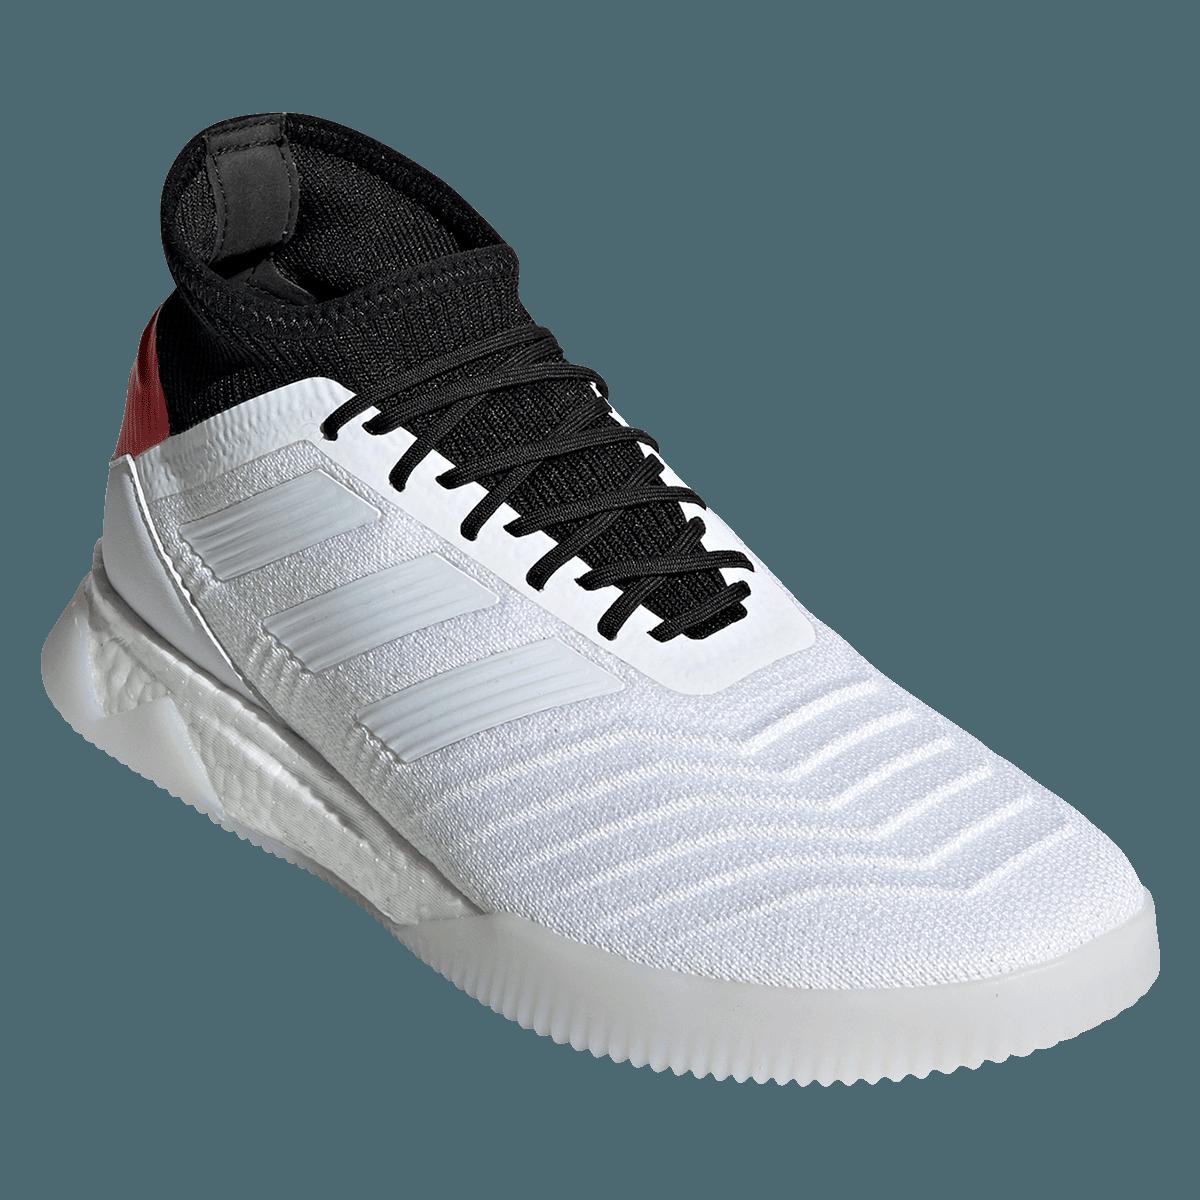 Adidas Predator 19 Tr Weißrot 1 Schuh sCthQrd